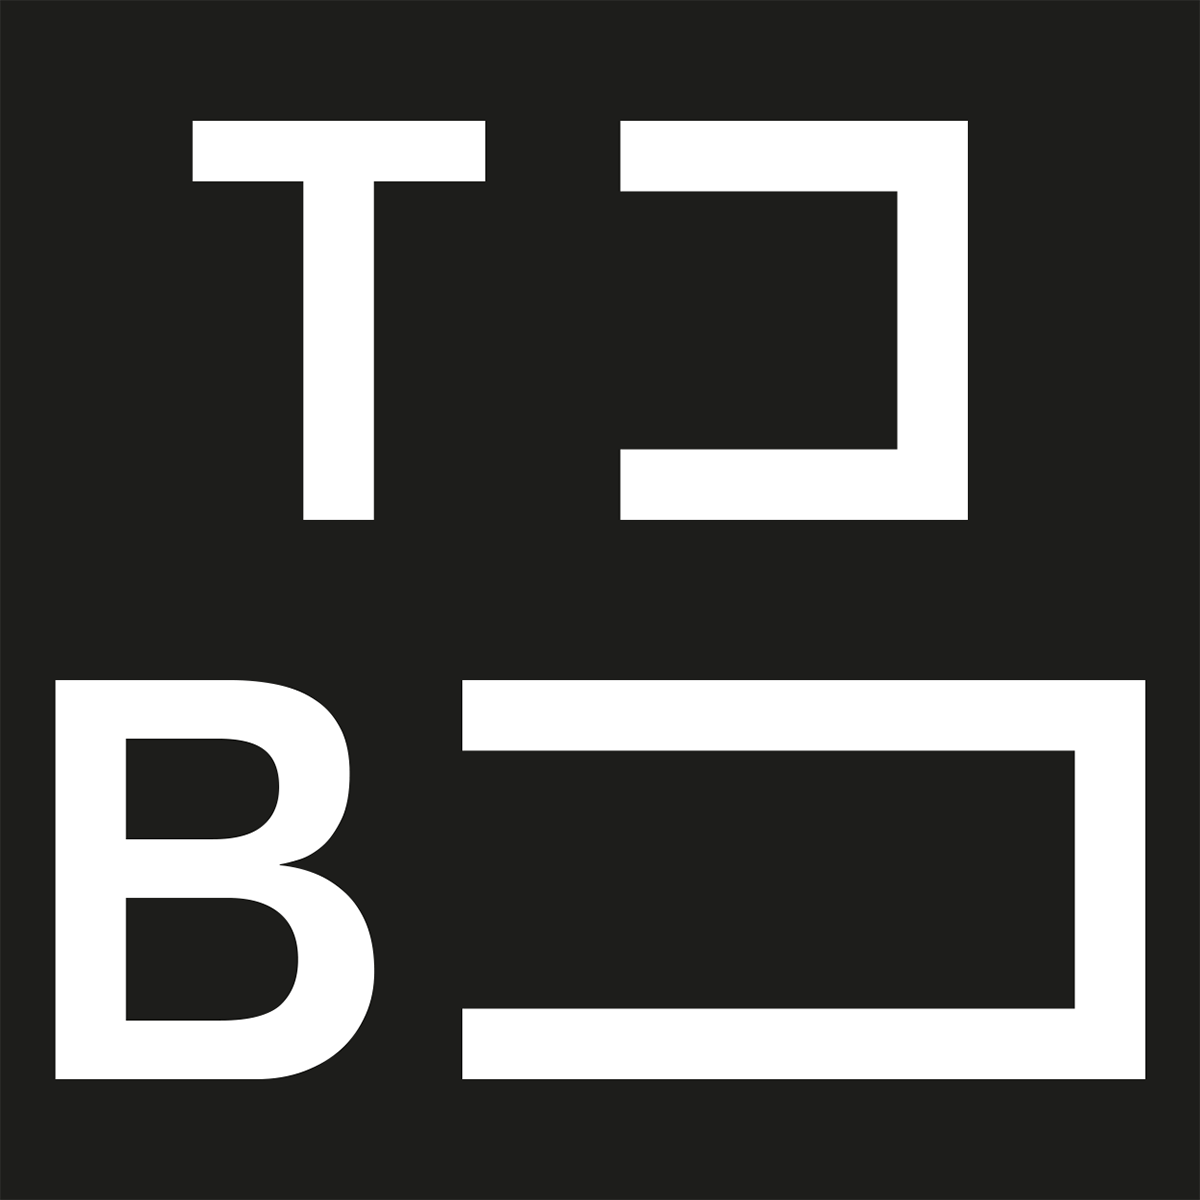 logo_b_hd